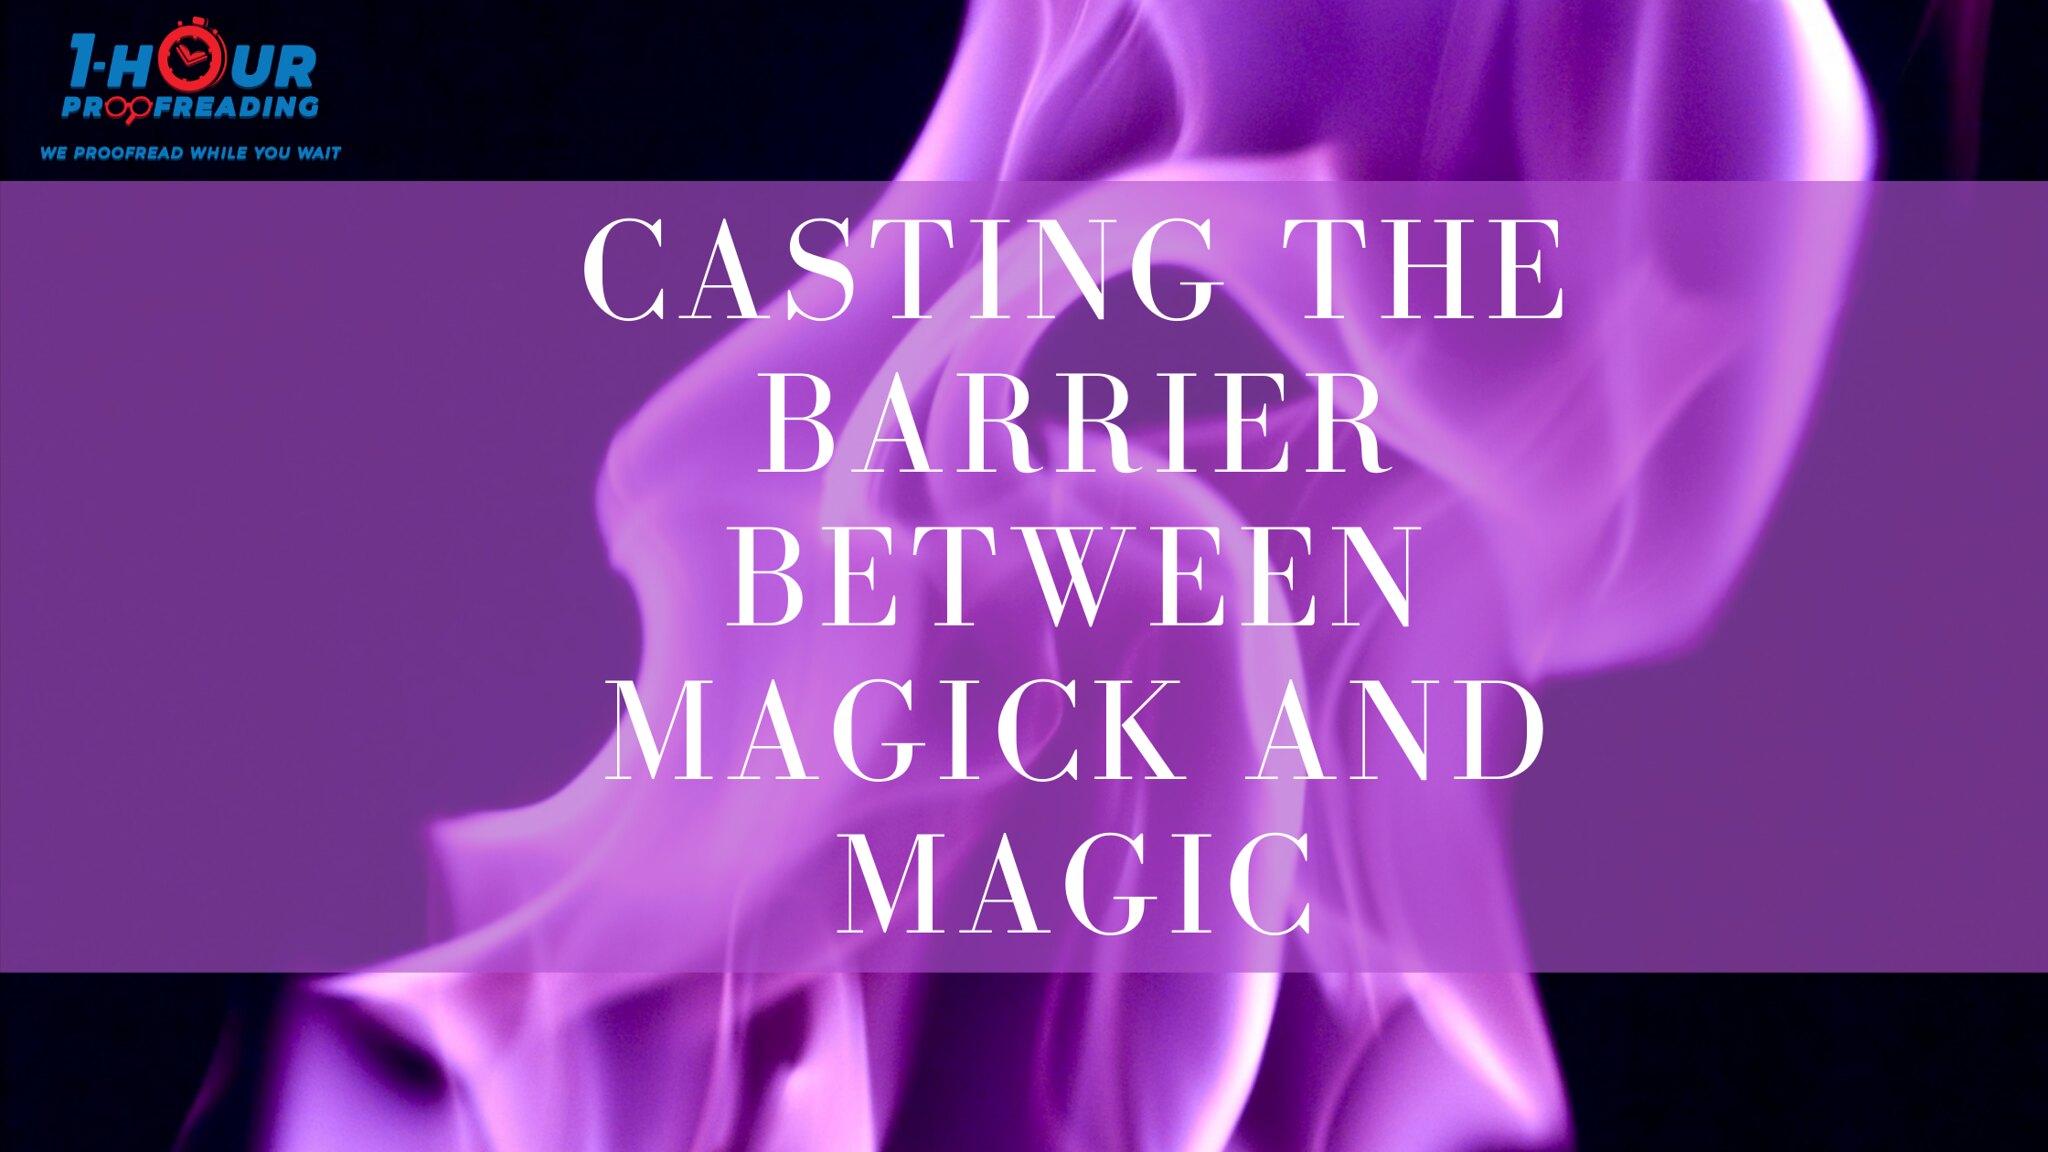 Magick and Magic